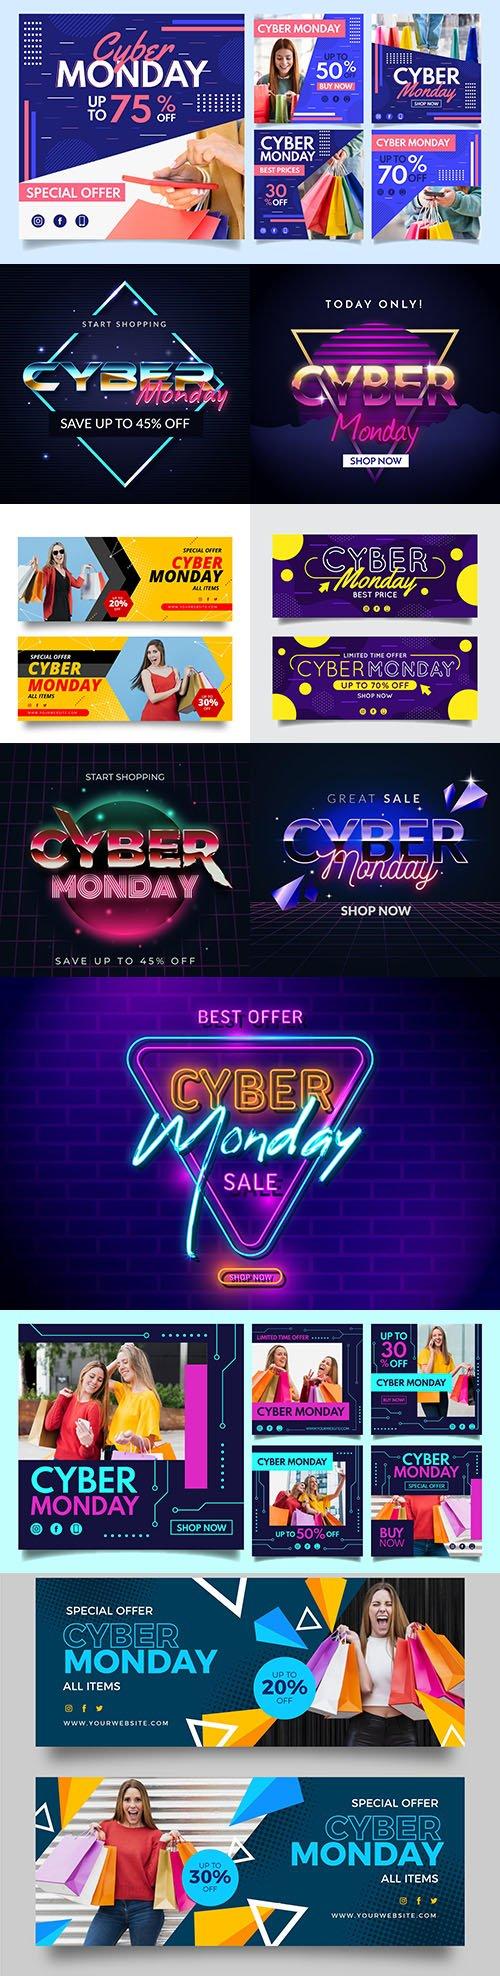 Cyber Monday retro futuristic shopping starts and instagram post